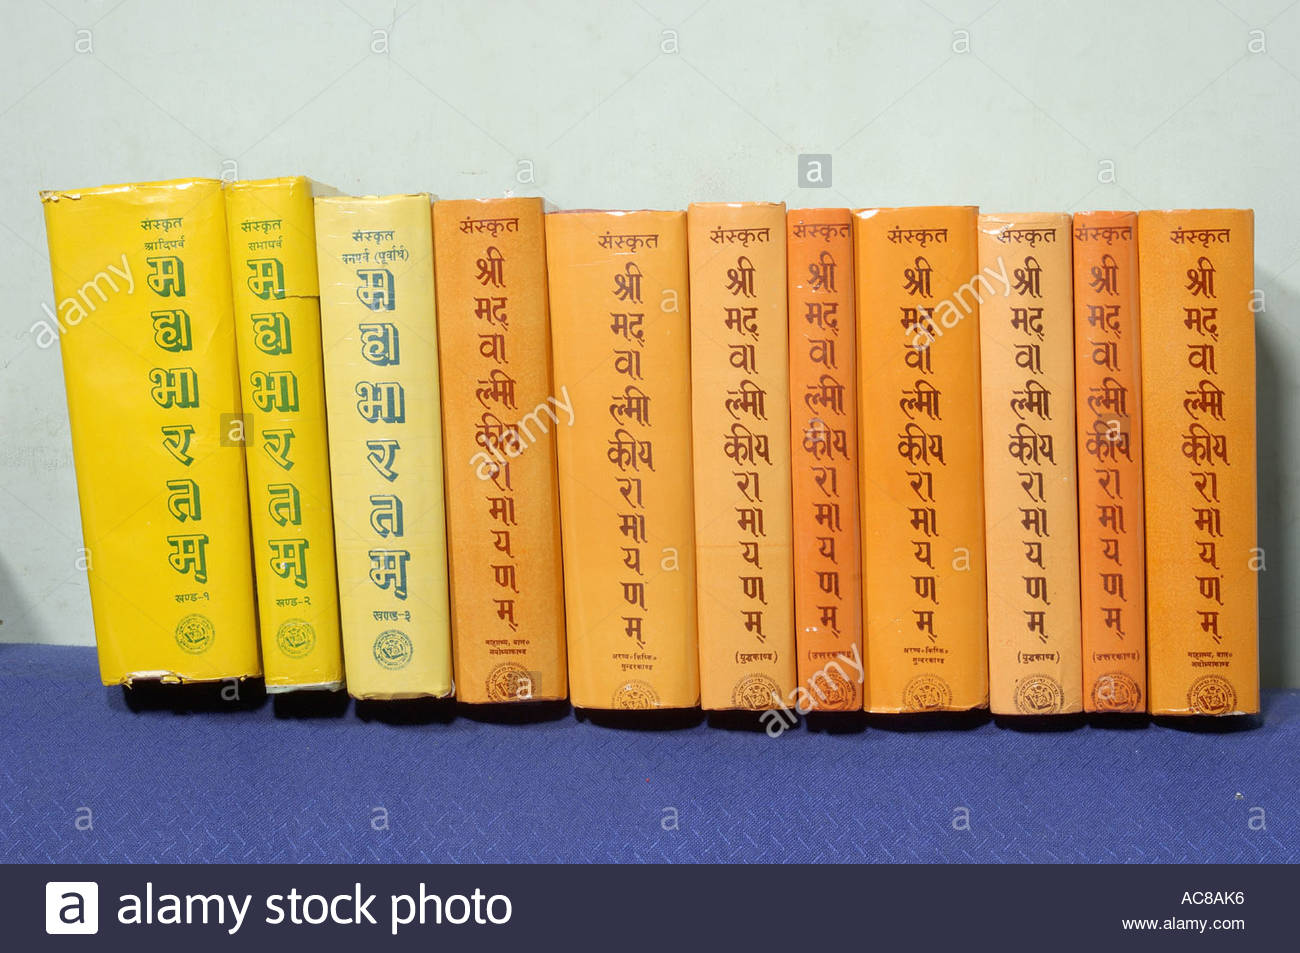 MAK79152 Hinduism Indian old ancient books on Mahabharat and Ramayan in Sanskrit - Stock Image